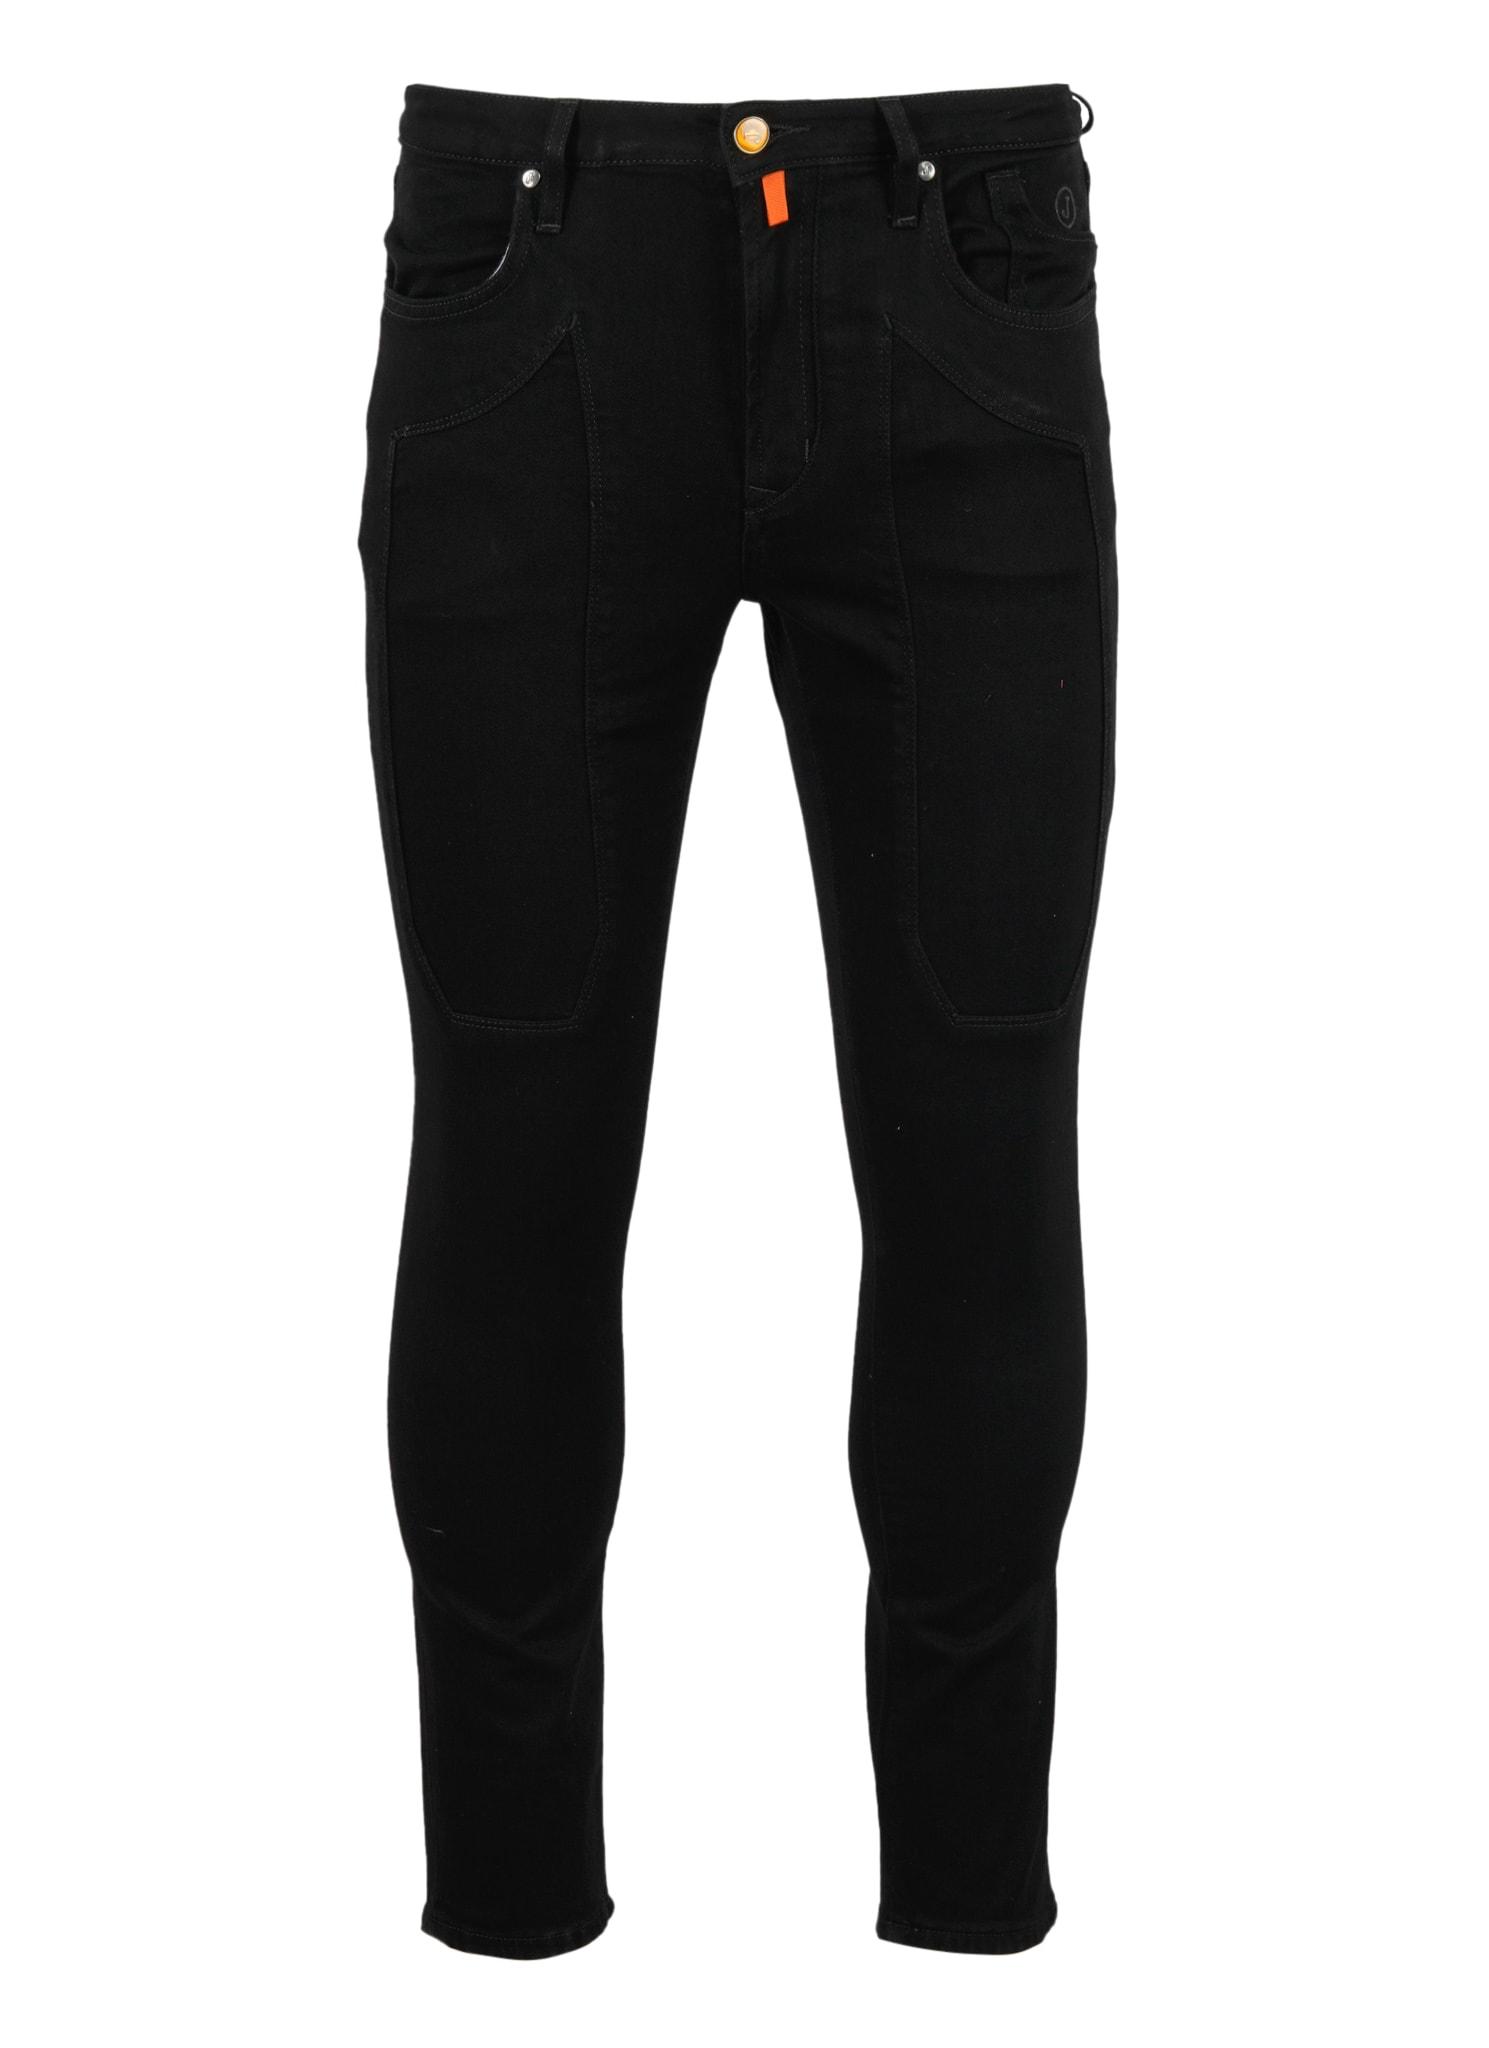 Pantal. Uomo Trousers